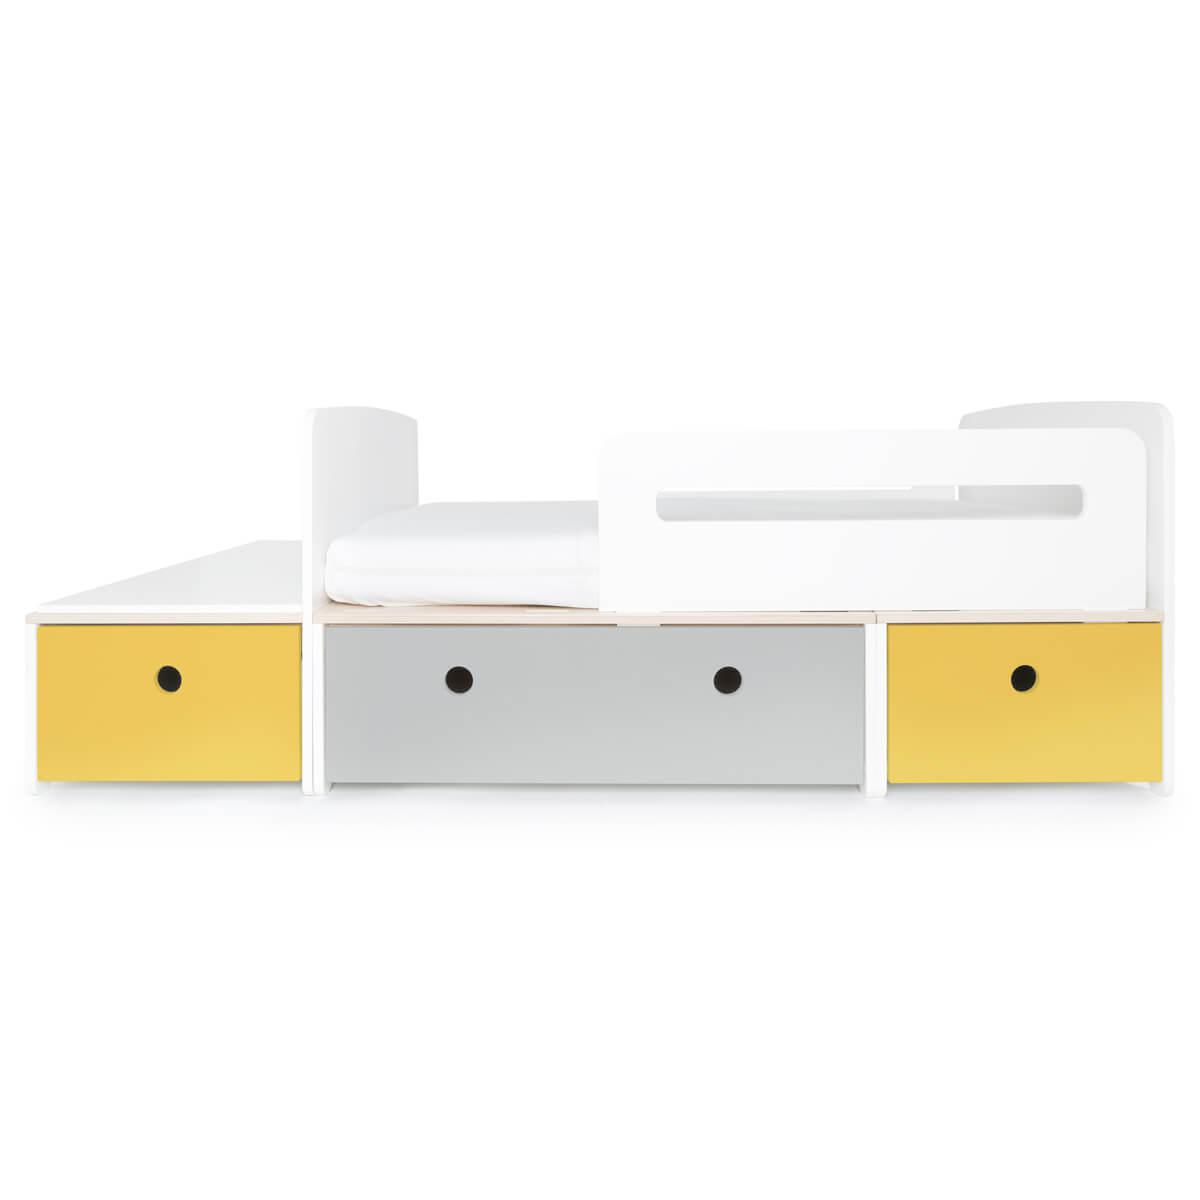 Juniorbett mitwachsend 90x150/200cm COLORFLEX nectar yellow-pearl grey-nectar yellow